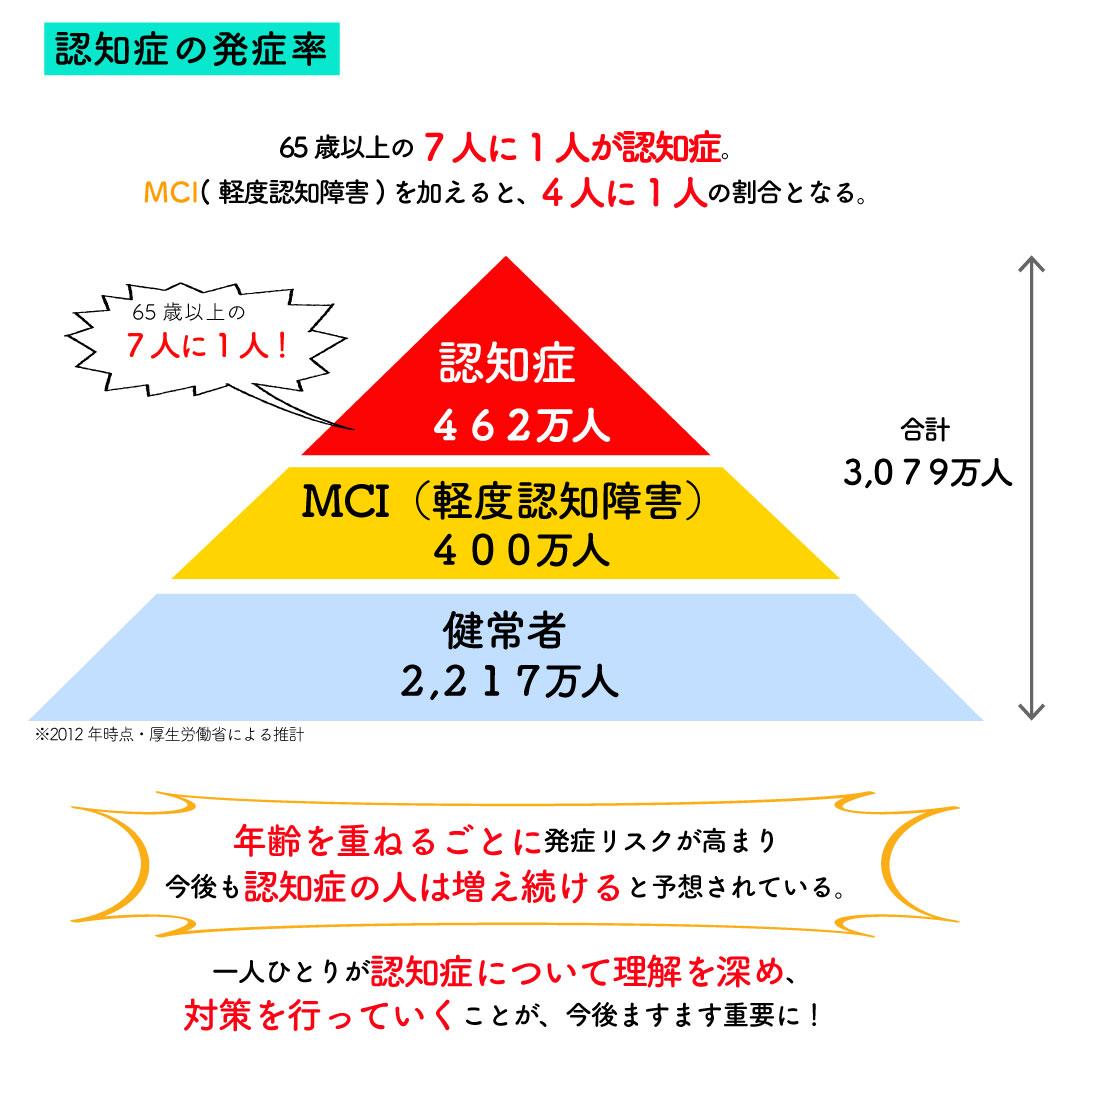 MAG6-10_親の介護①_認知症の発生率図表.jpg